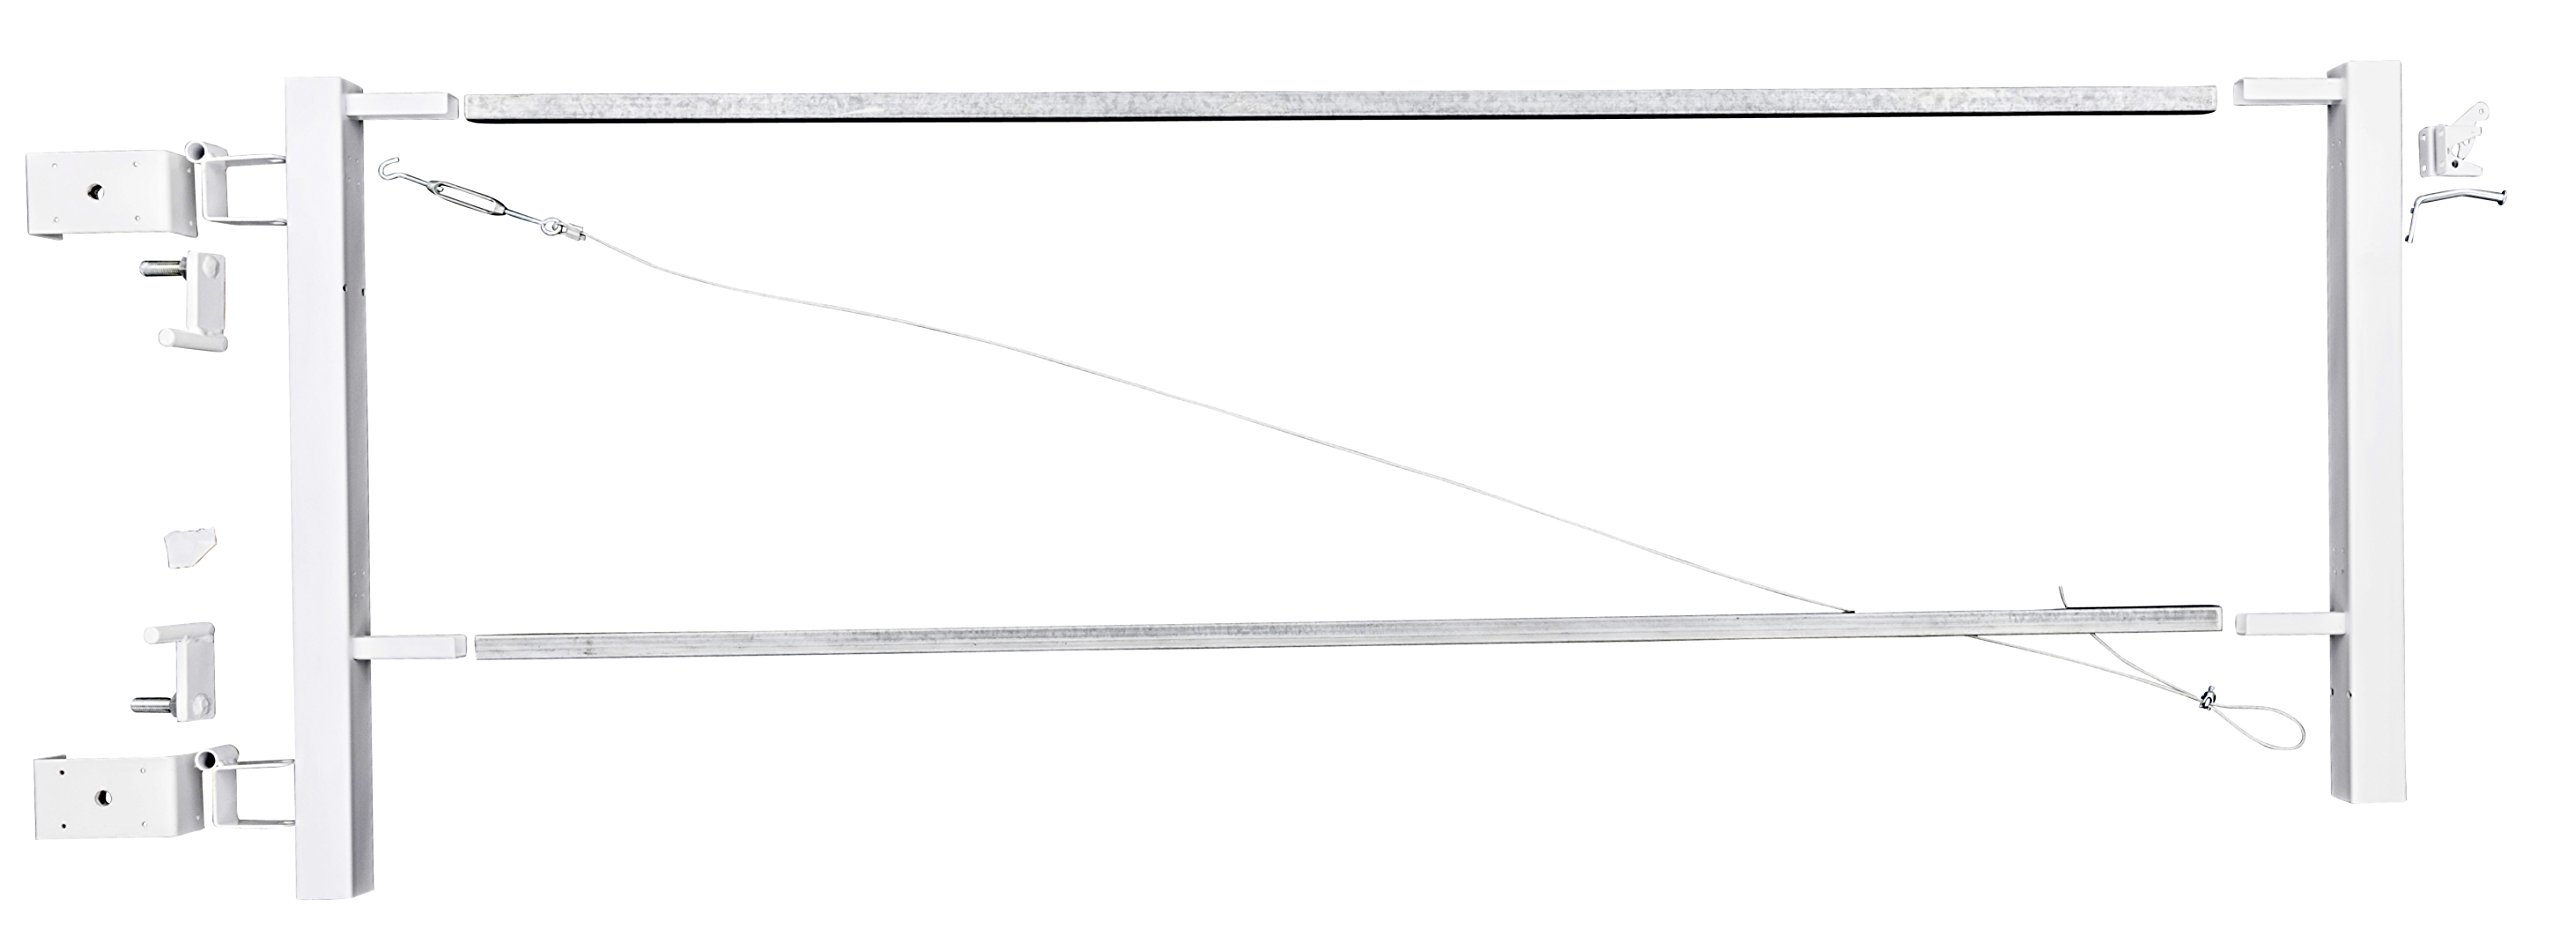 Vinyl Fence Walk Through Gate Kit - Adjust-A-Gate Steel Frame No Sag ...